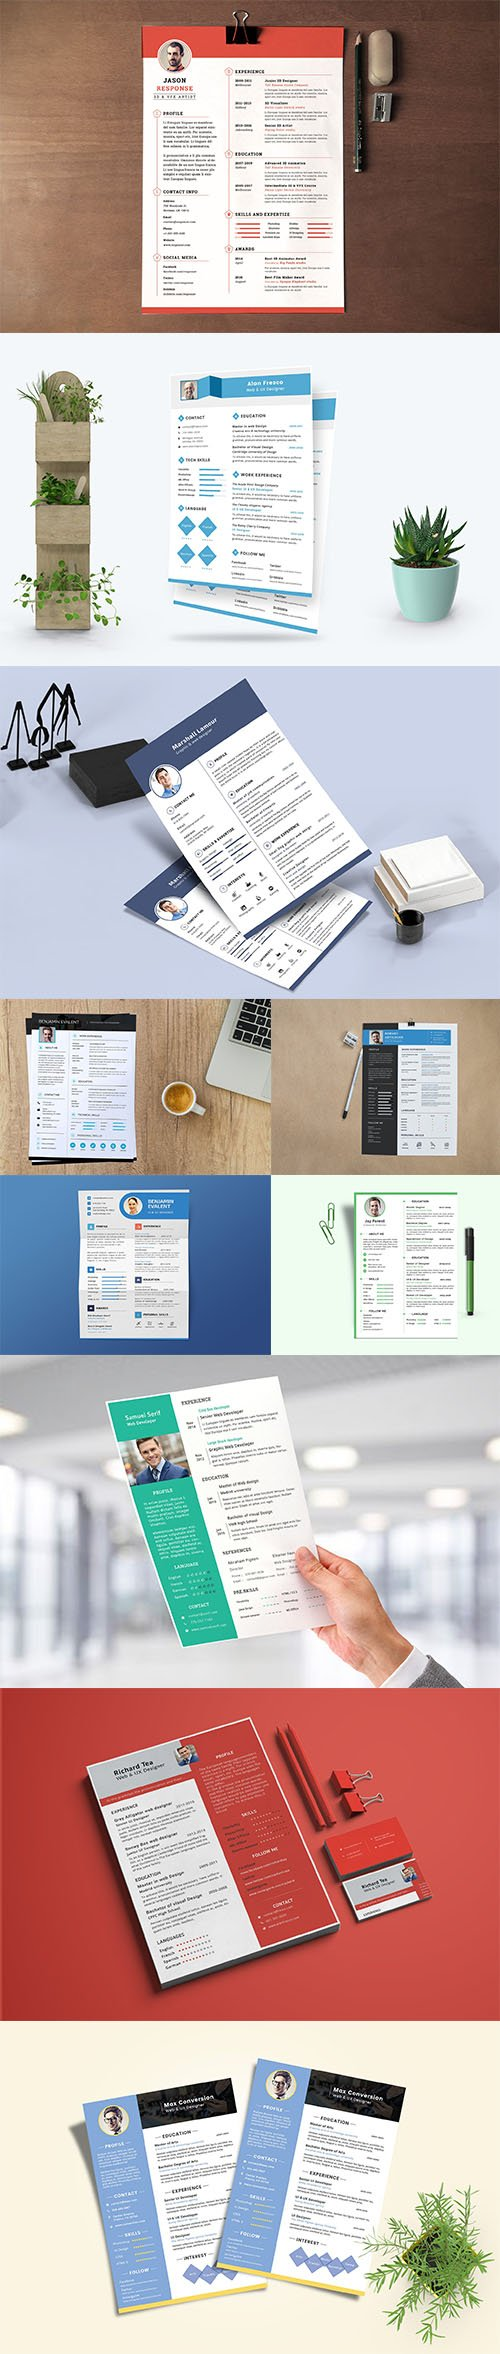 Resume / CV Template PSD Set vol3